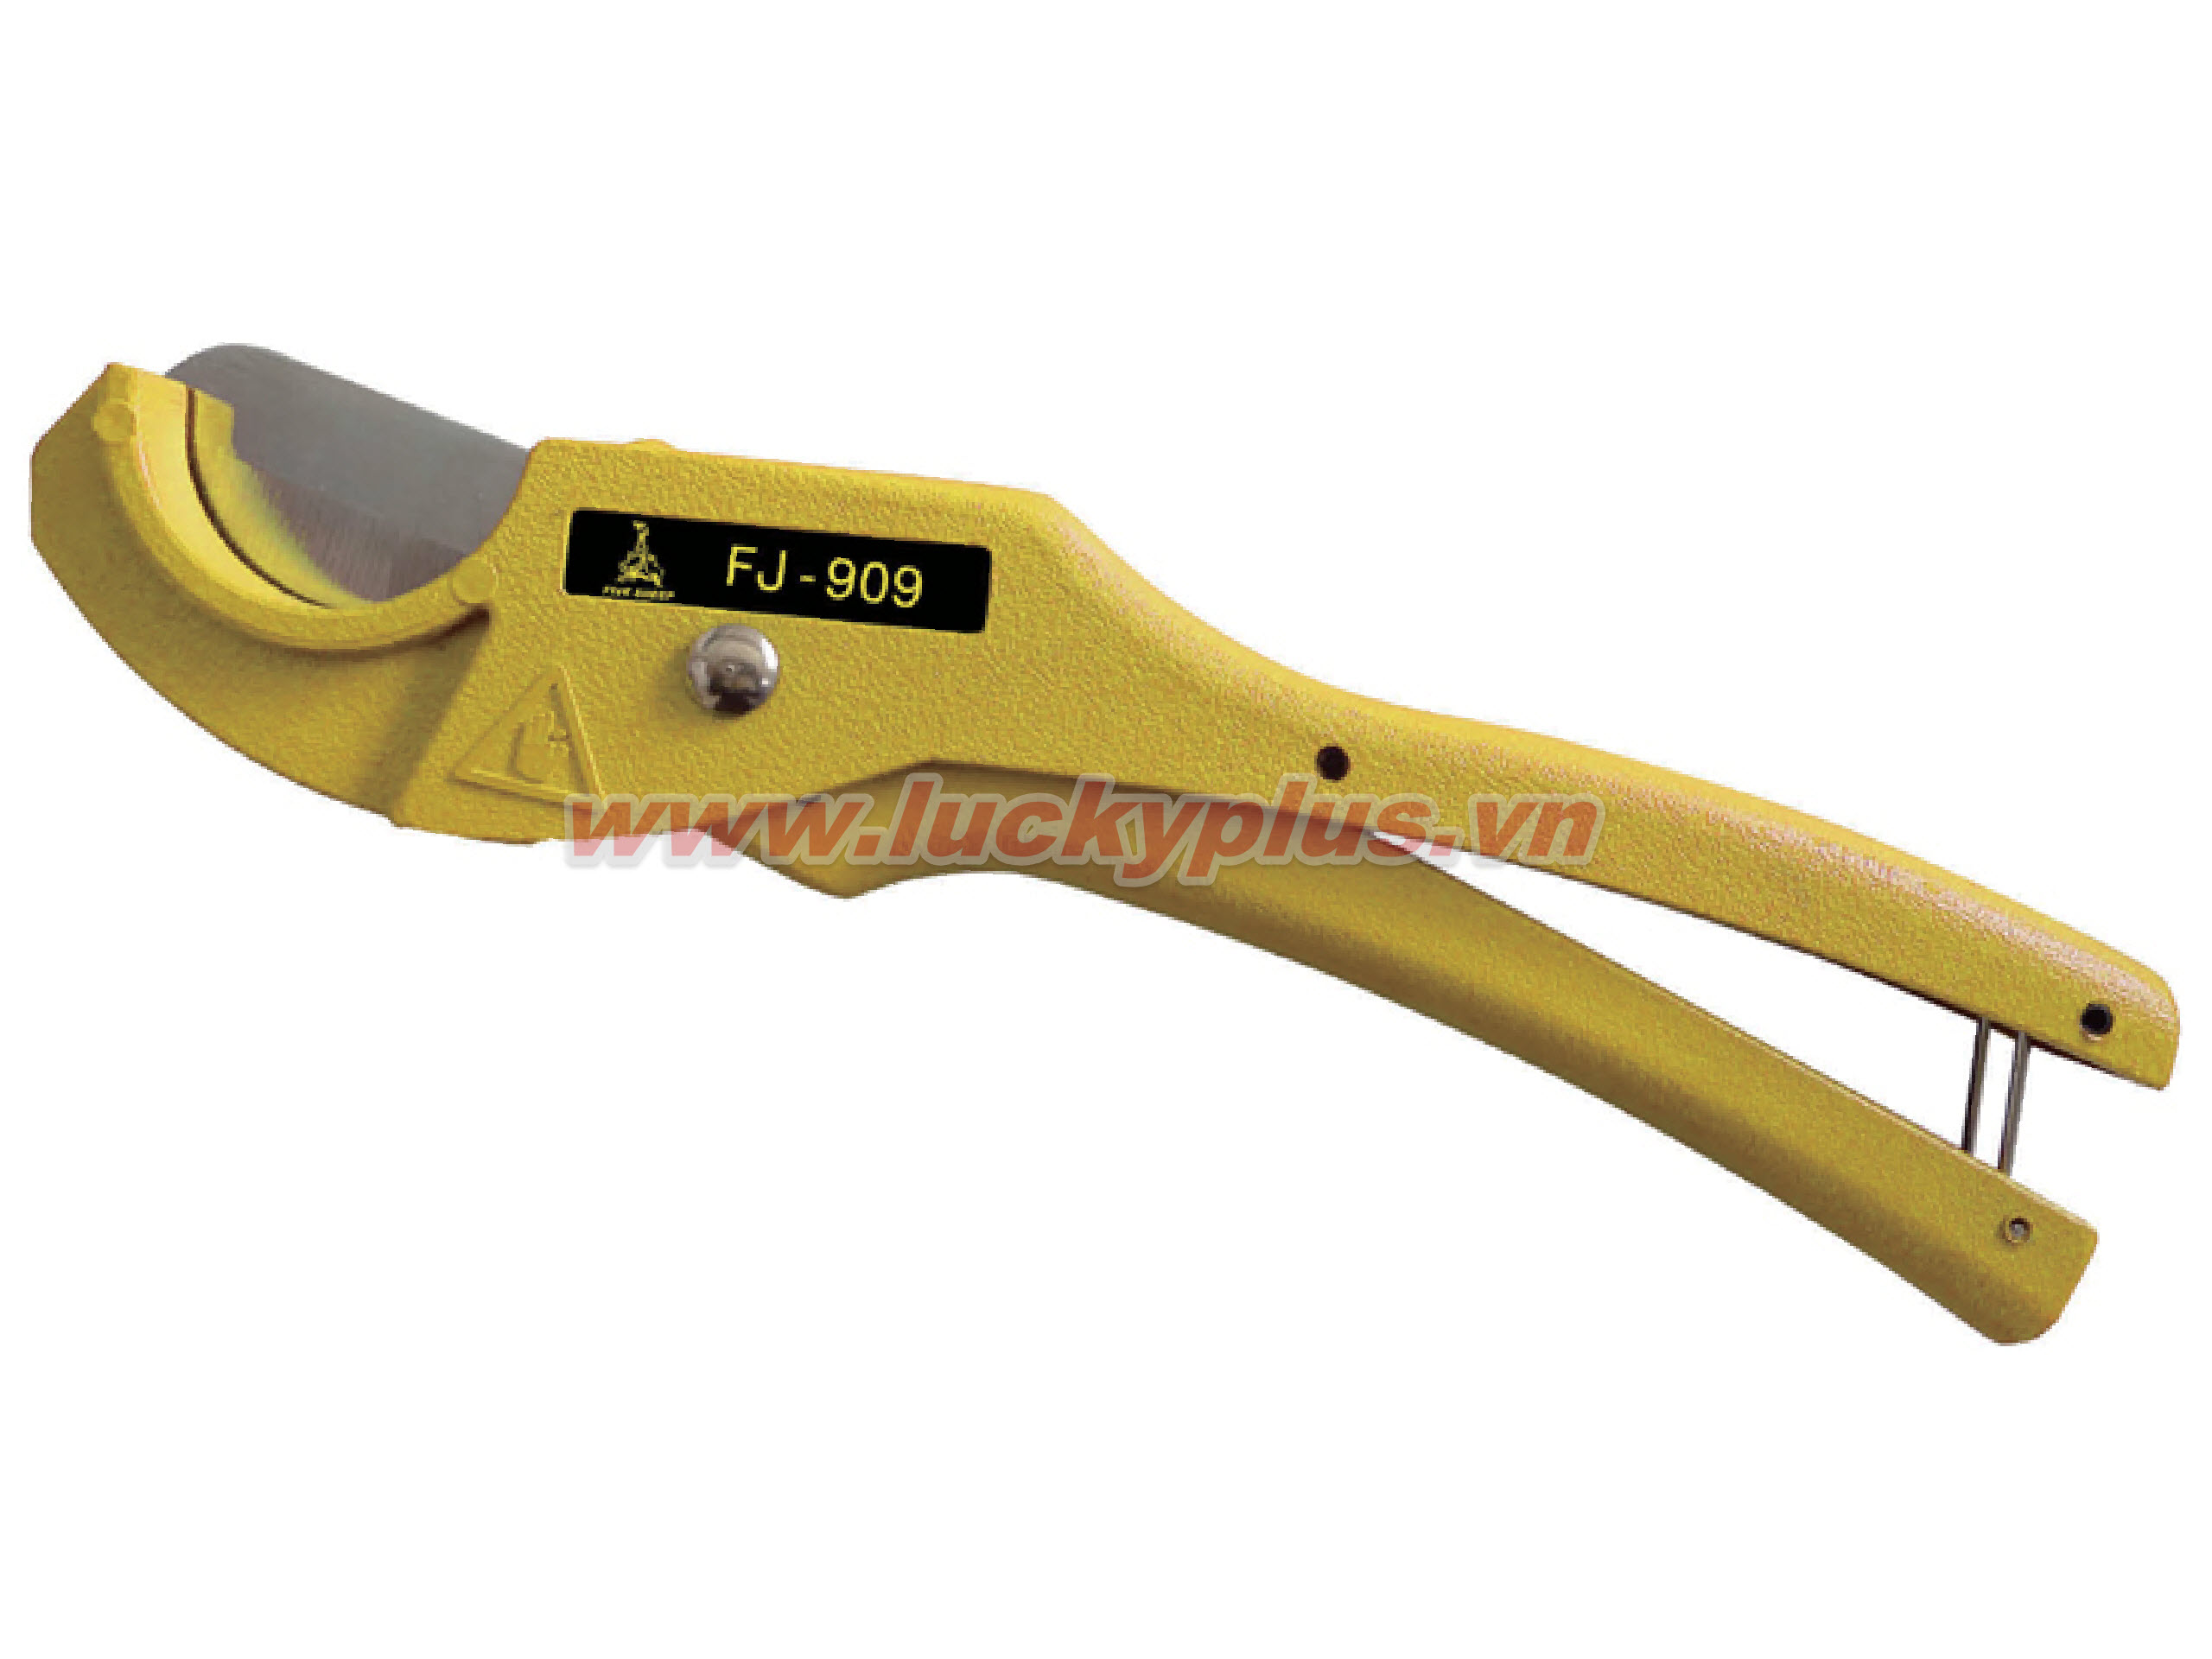 Dao cắt ống nhựa FiveSheep FJ-909 36mm